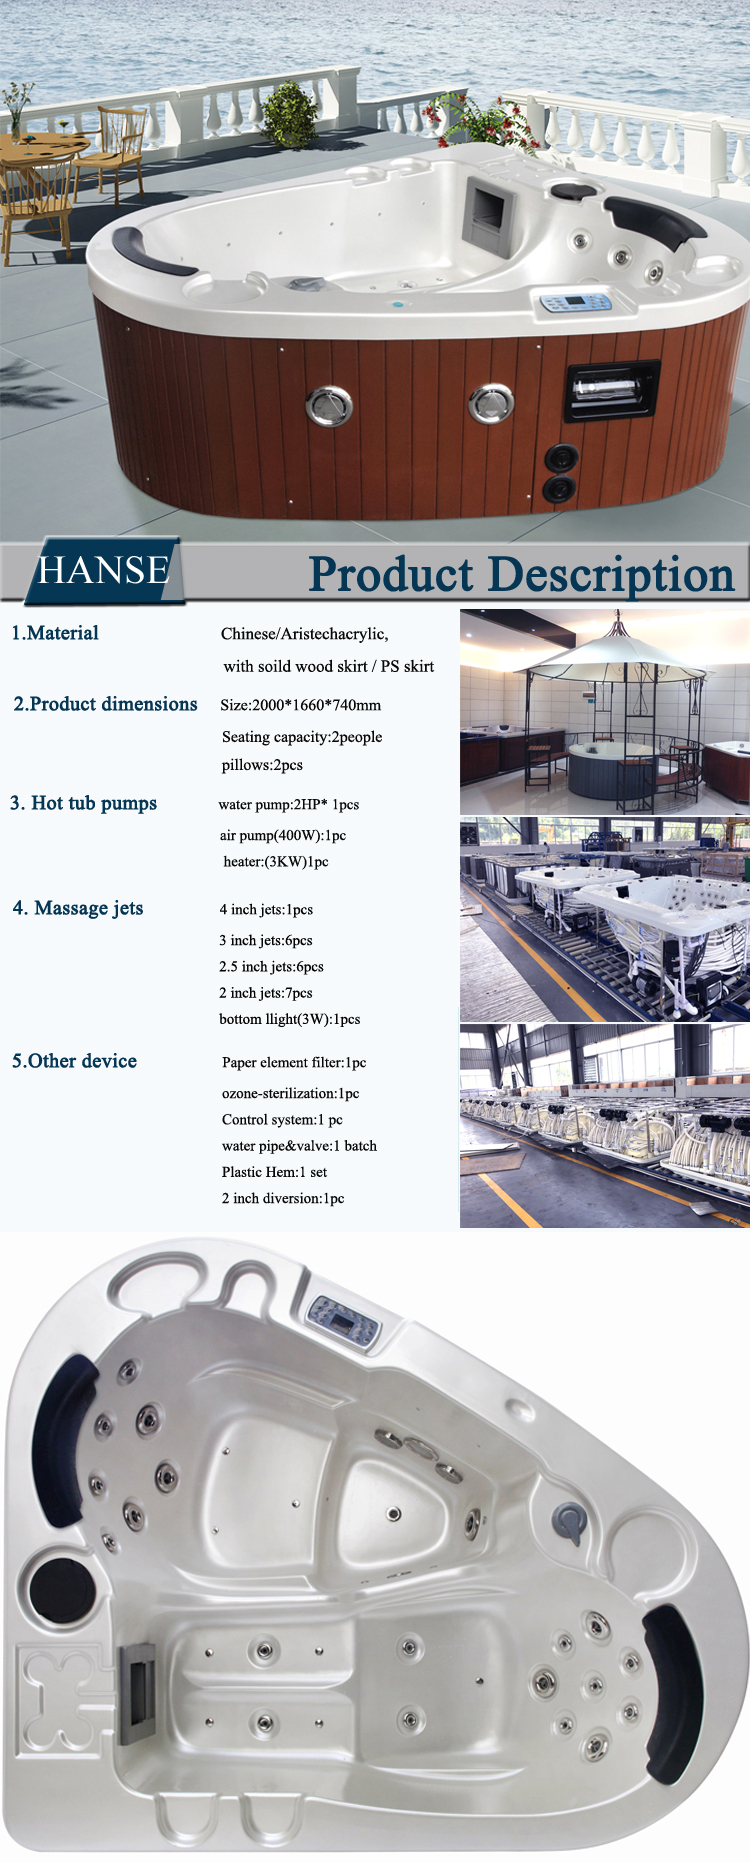 Hs-3358 2 Recliner Spa Tub For Wholesale Dutch Triangle Hot Tub Spa ...